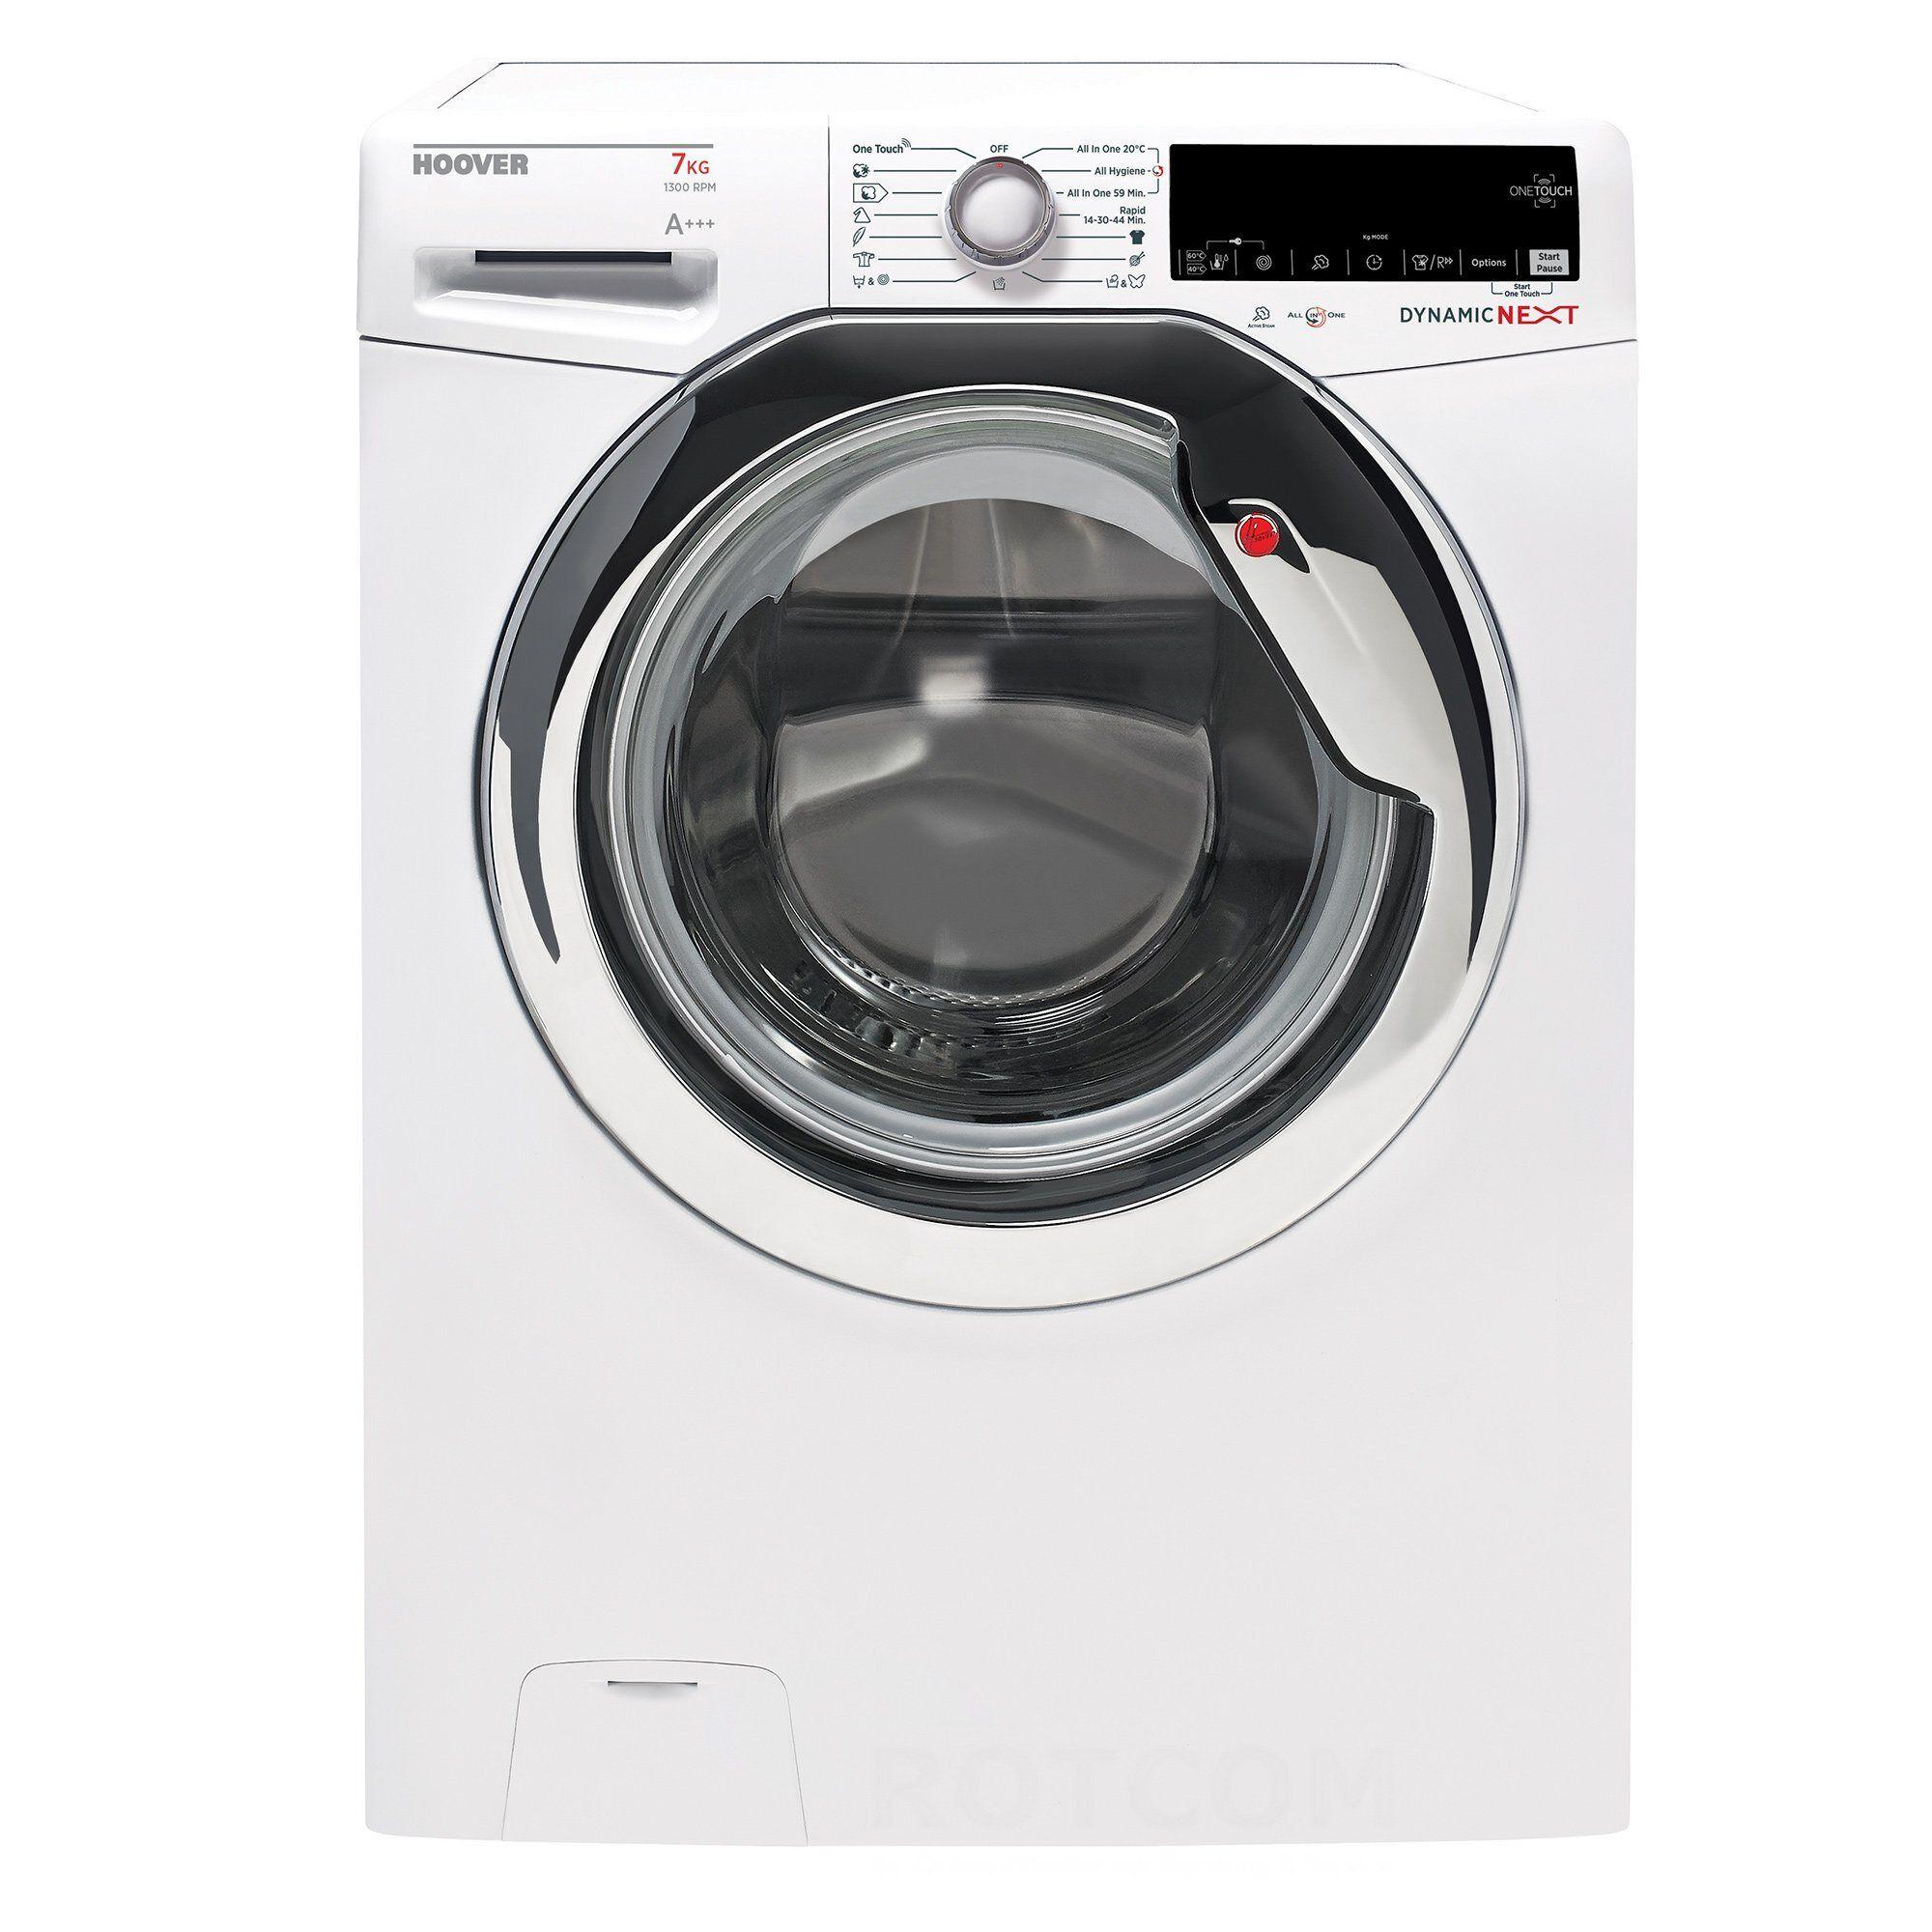 Hoover Waschmaschine DXOA4 37AHC3/1-S A+++, 7 kg, 1300 U/Min, Energieeffizienzklasse A+++